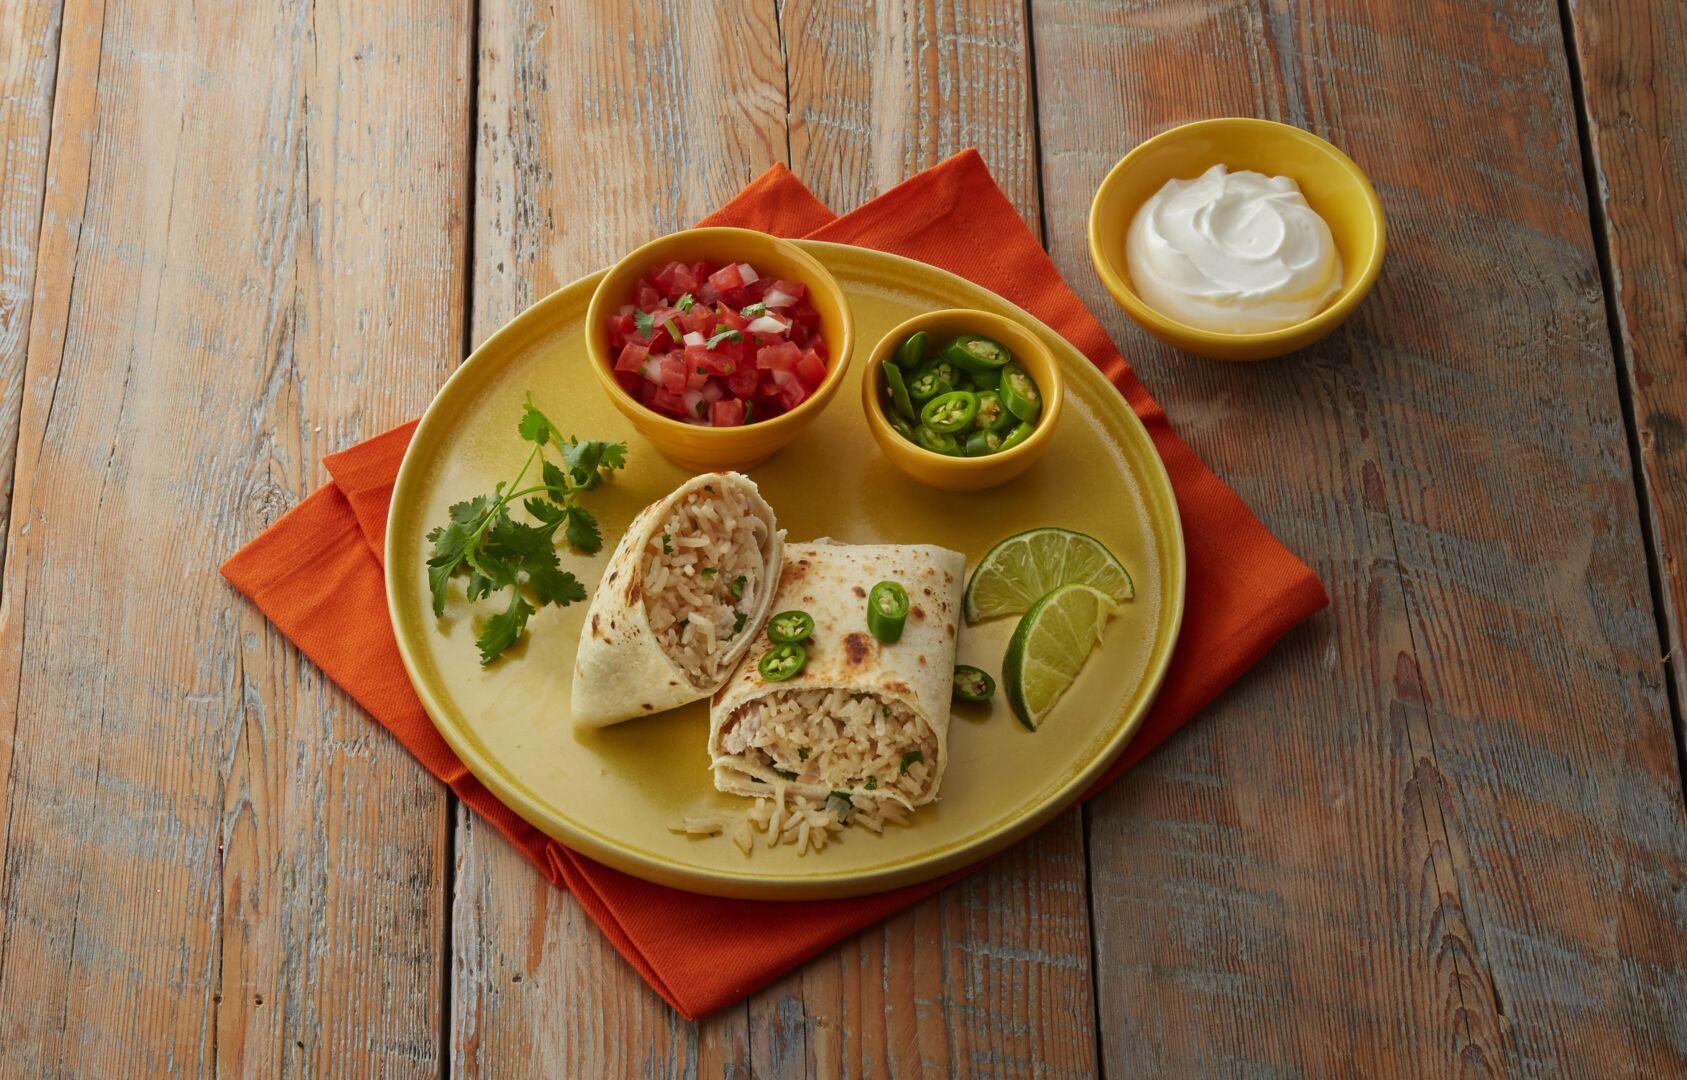 Turkey and Cilantro Lime Rice Burritos